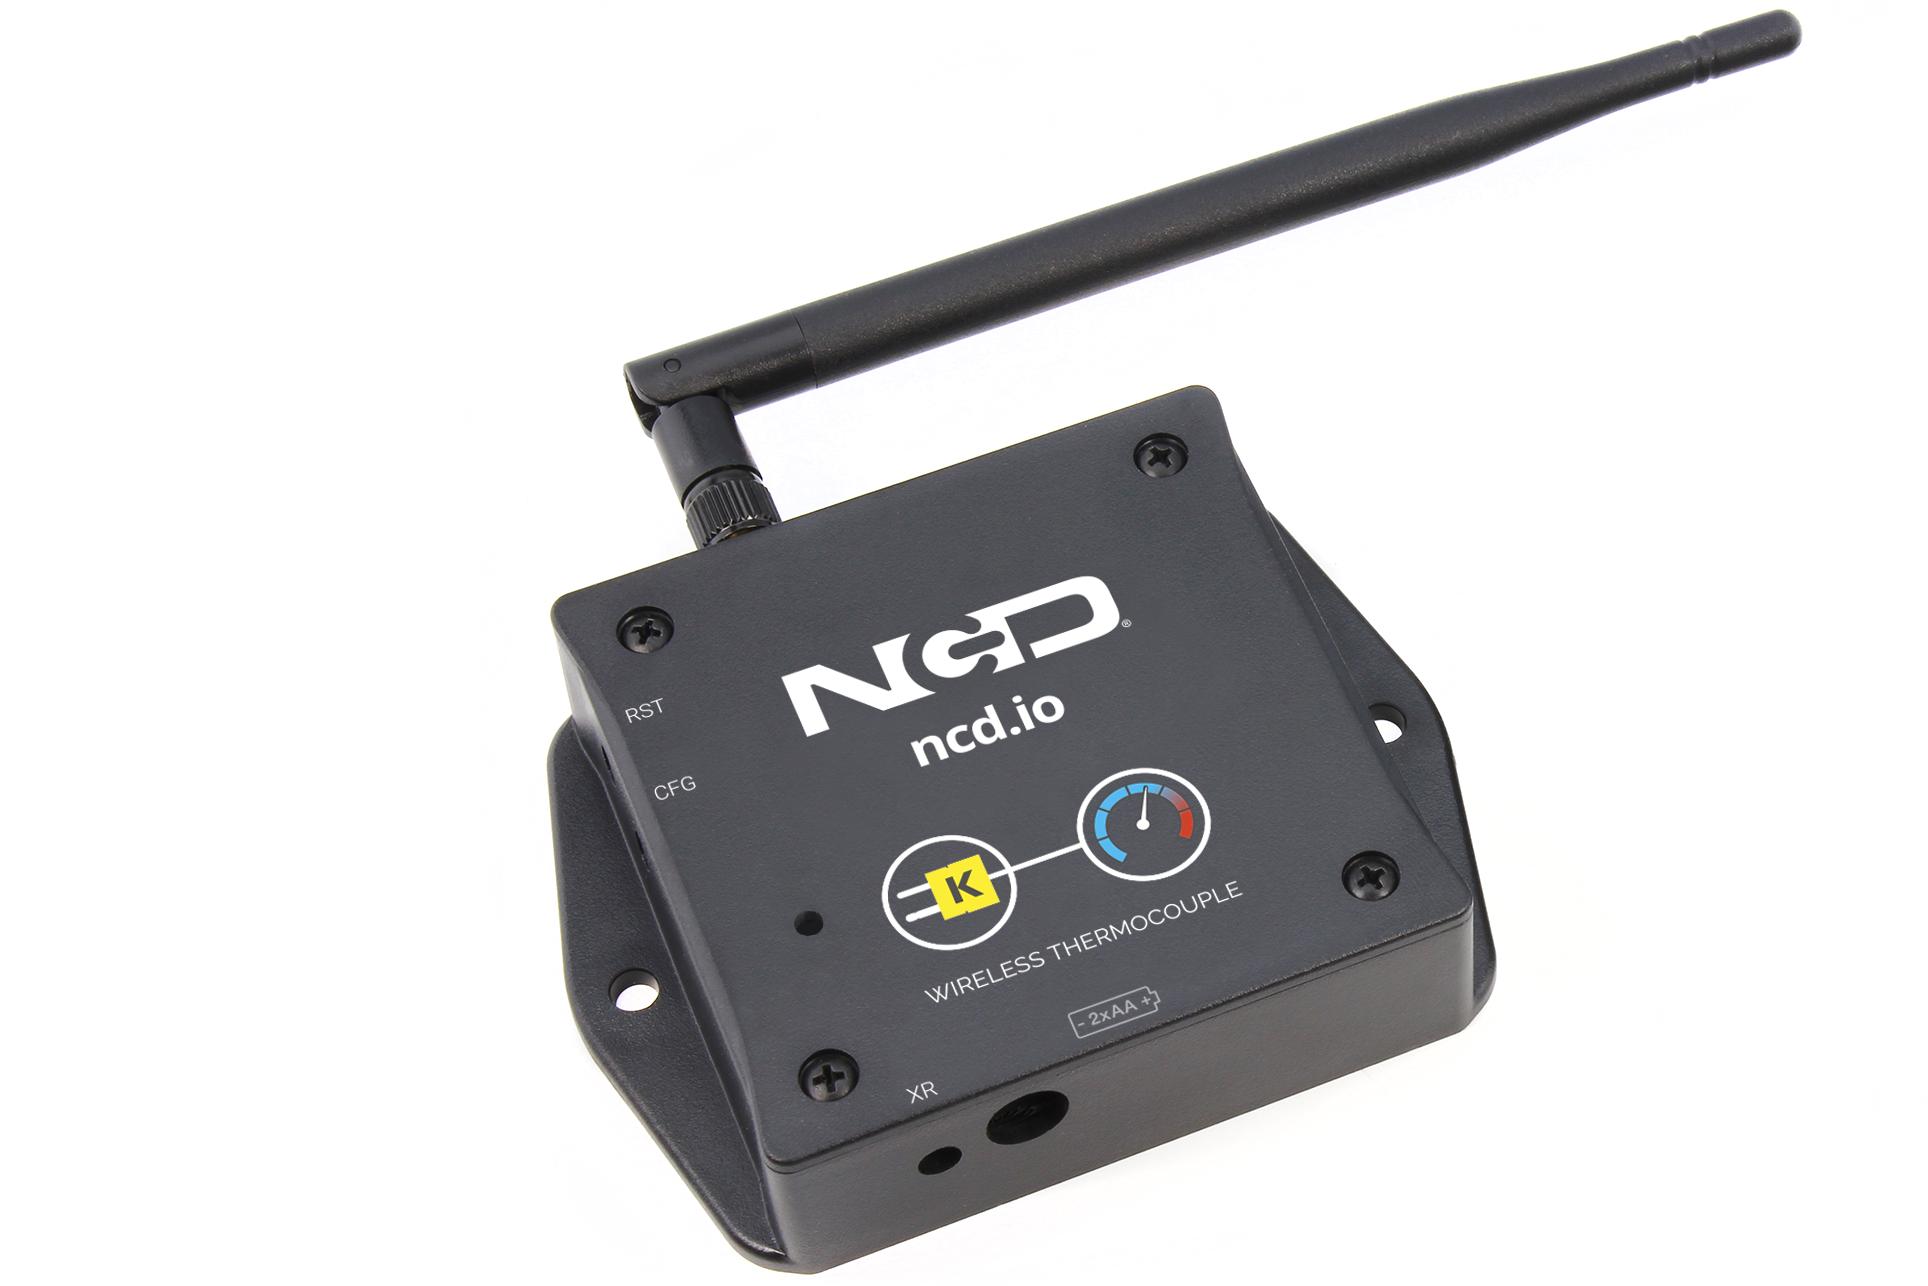 IoT Long Range Wireless Thermocouple Temperature Sensor